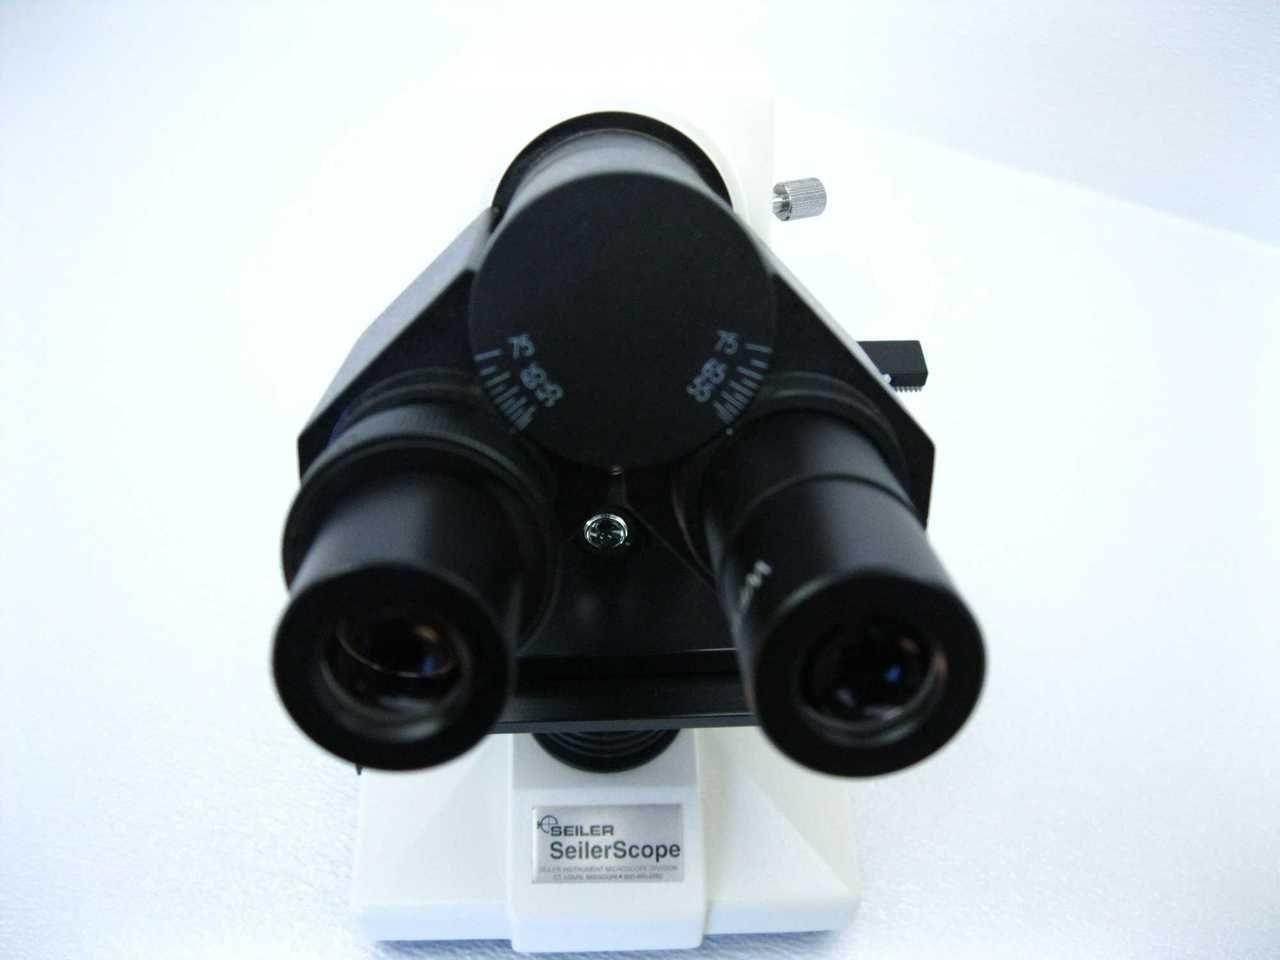 Microscope, SeilerScope Precision Binocular - SXS820